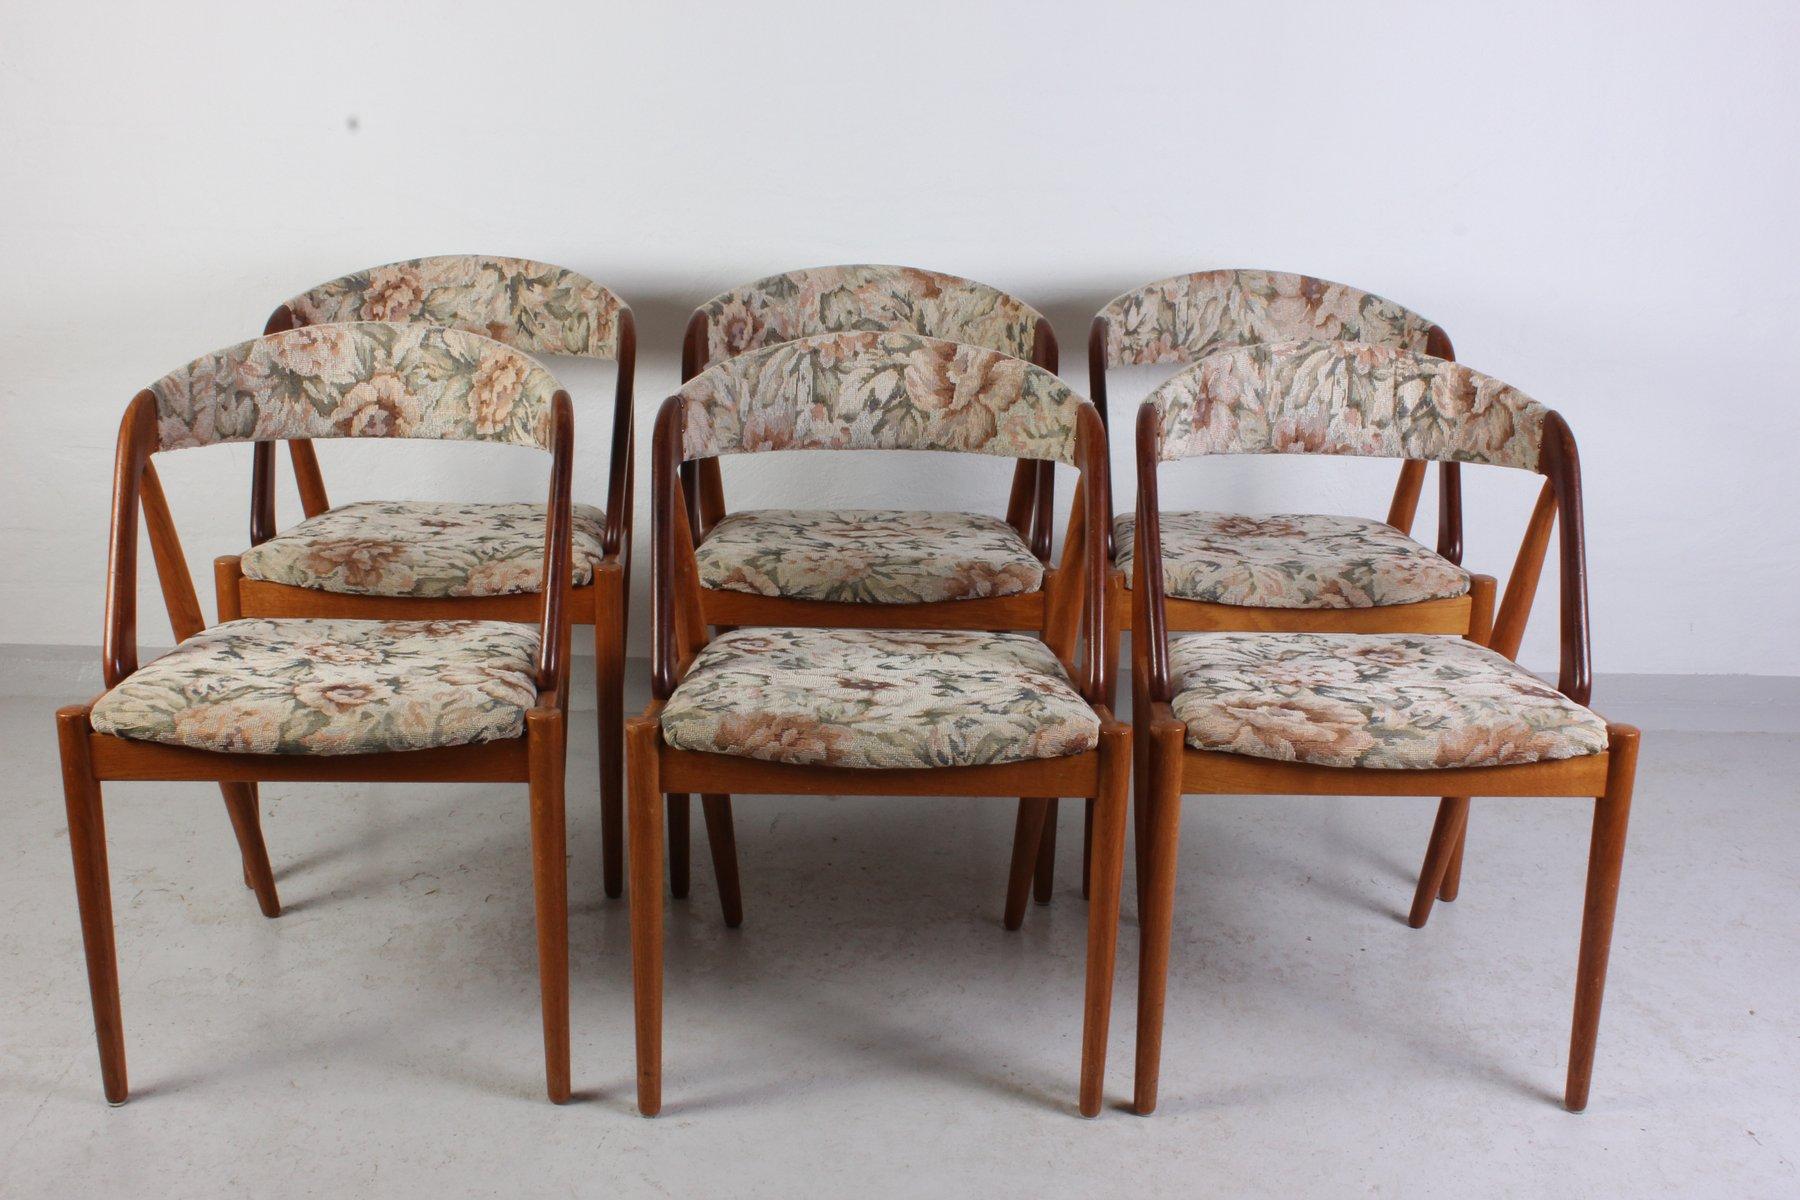 Mid Century Dining Chairs By Kai Kristiansen, Set Of 6